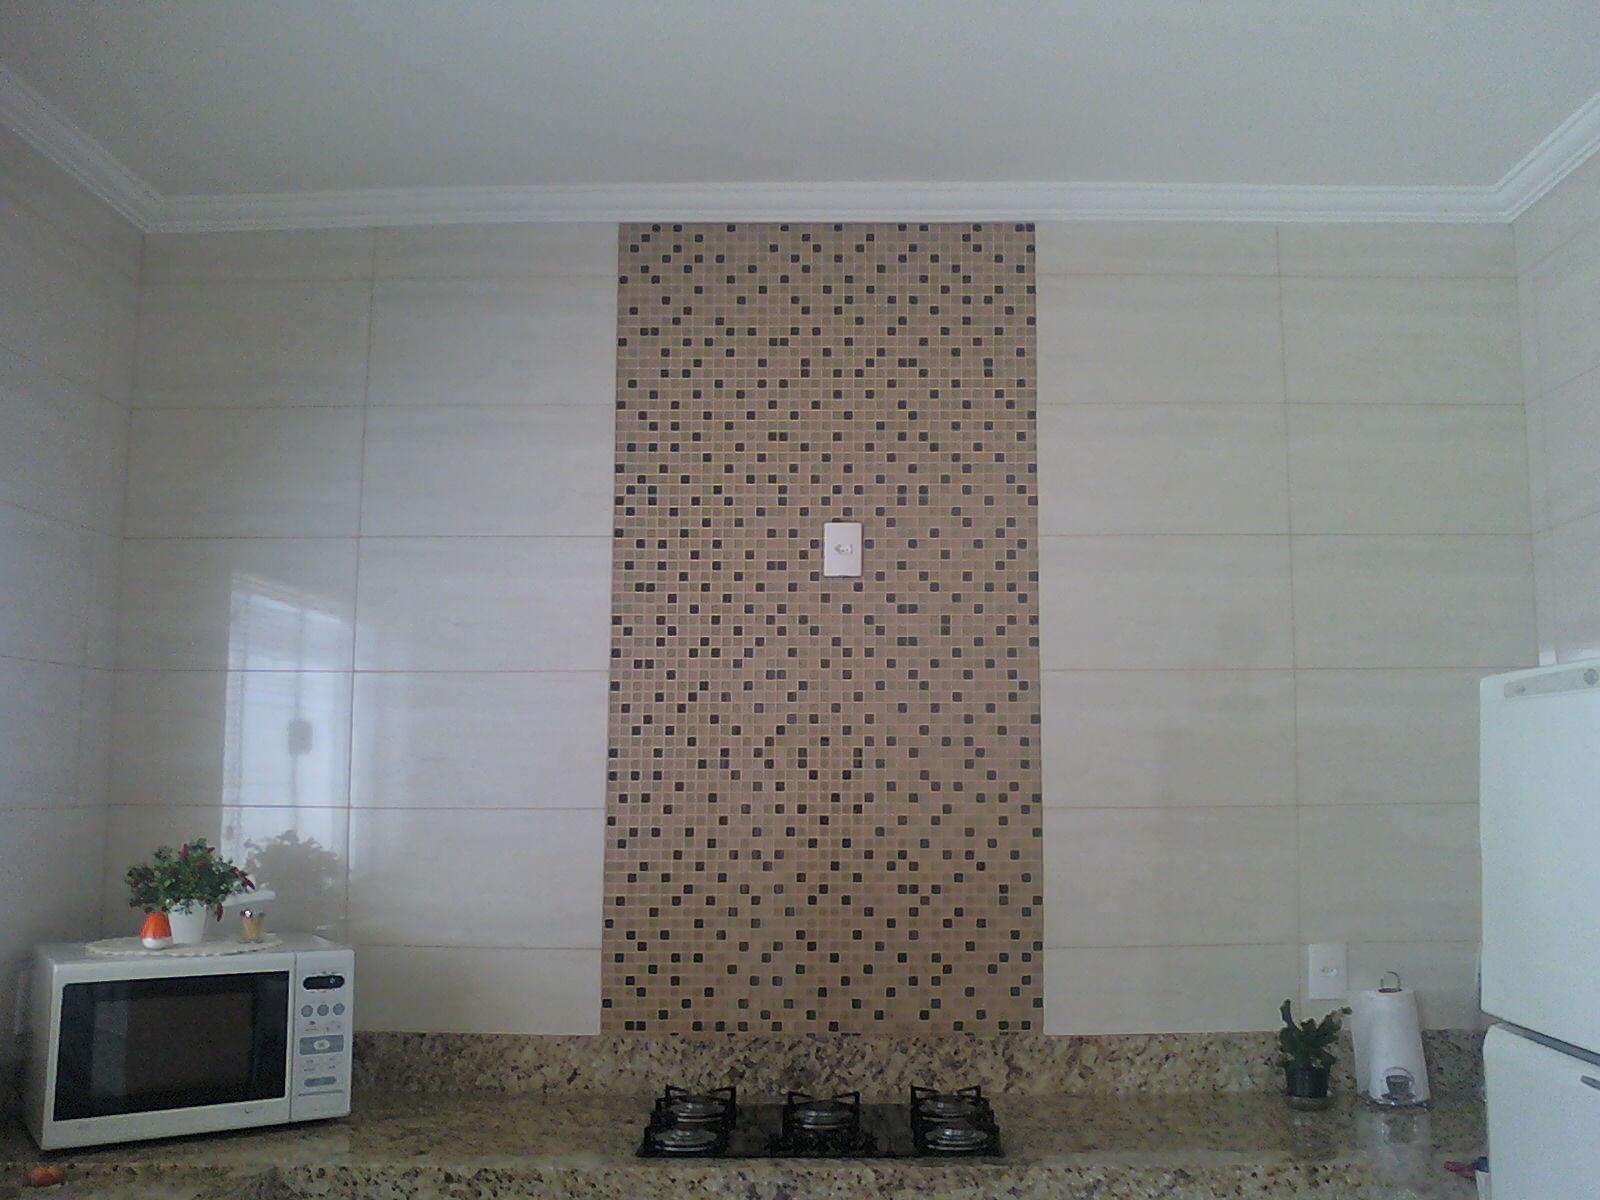 Acabamentos Finos: Porcelanato e pastilhas de vidro #4E627D 1600x1200 Banheiro Com Porcelanato E Pastilha De Vidro